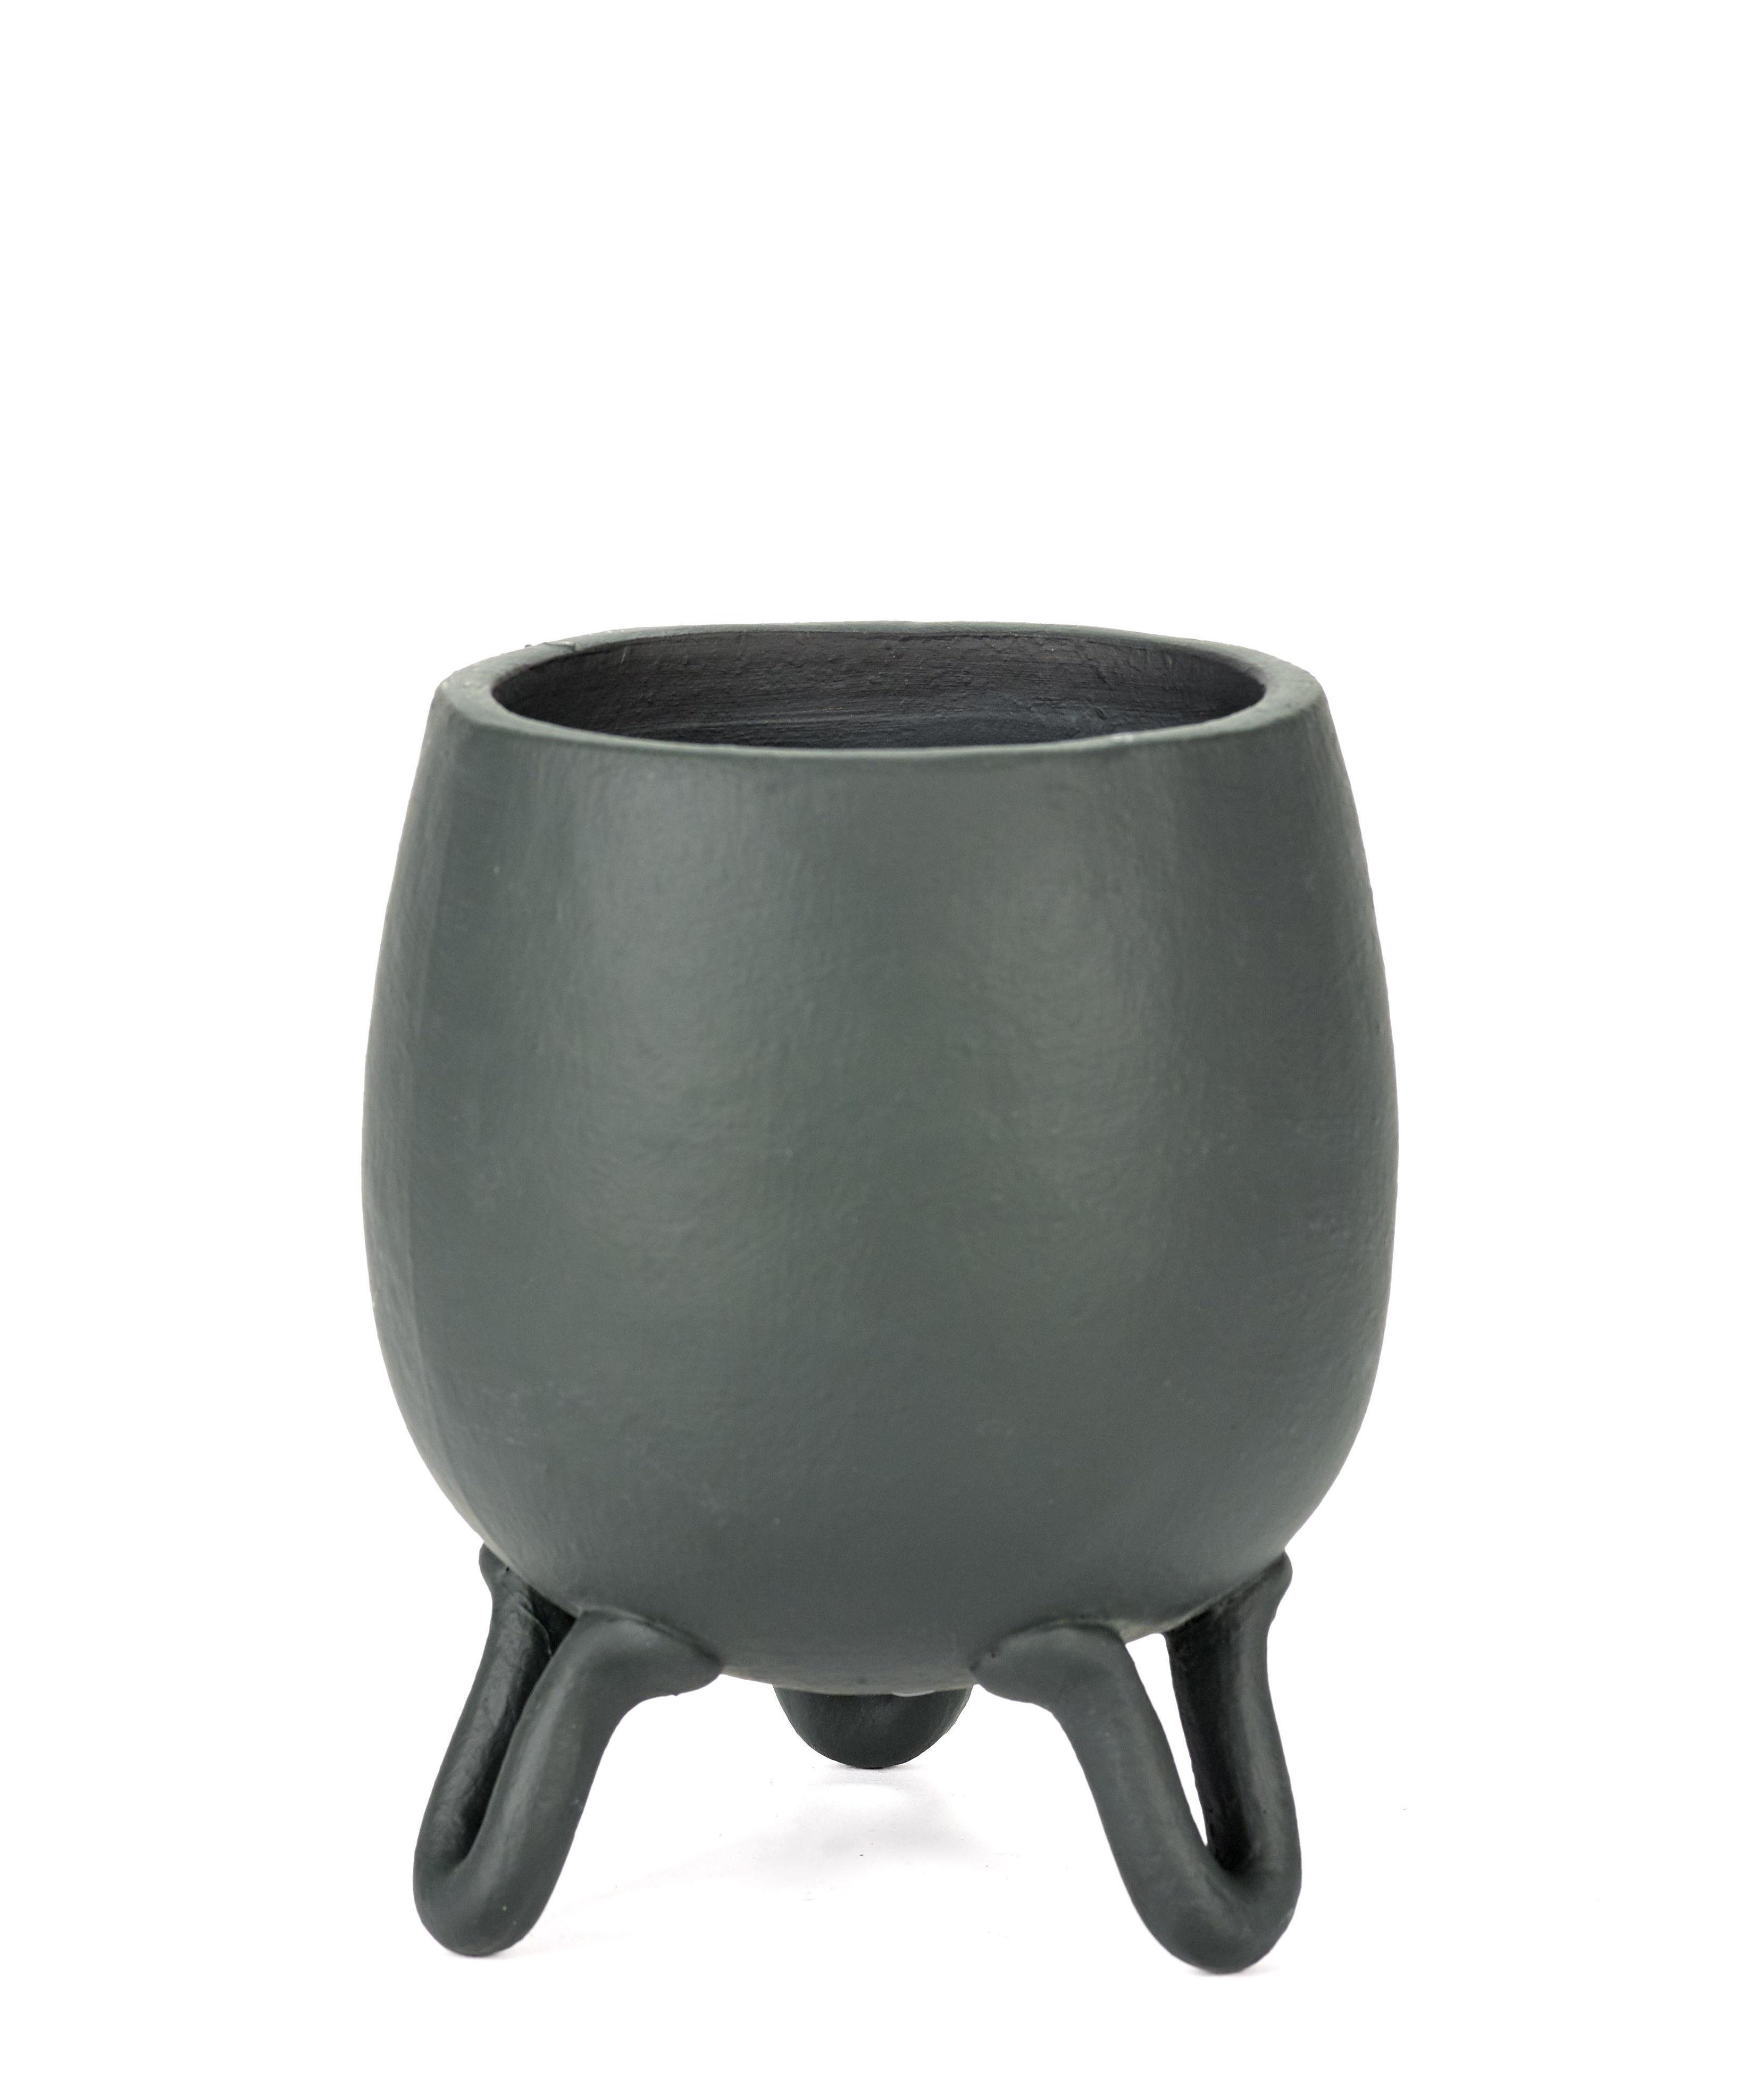 Decoration - Flower Pots & House Plants - Antes Flower-pot holder - / Ø 12.5 x H 18 cm - Terracotta by Serax - Dark green - Terracotta